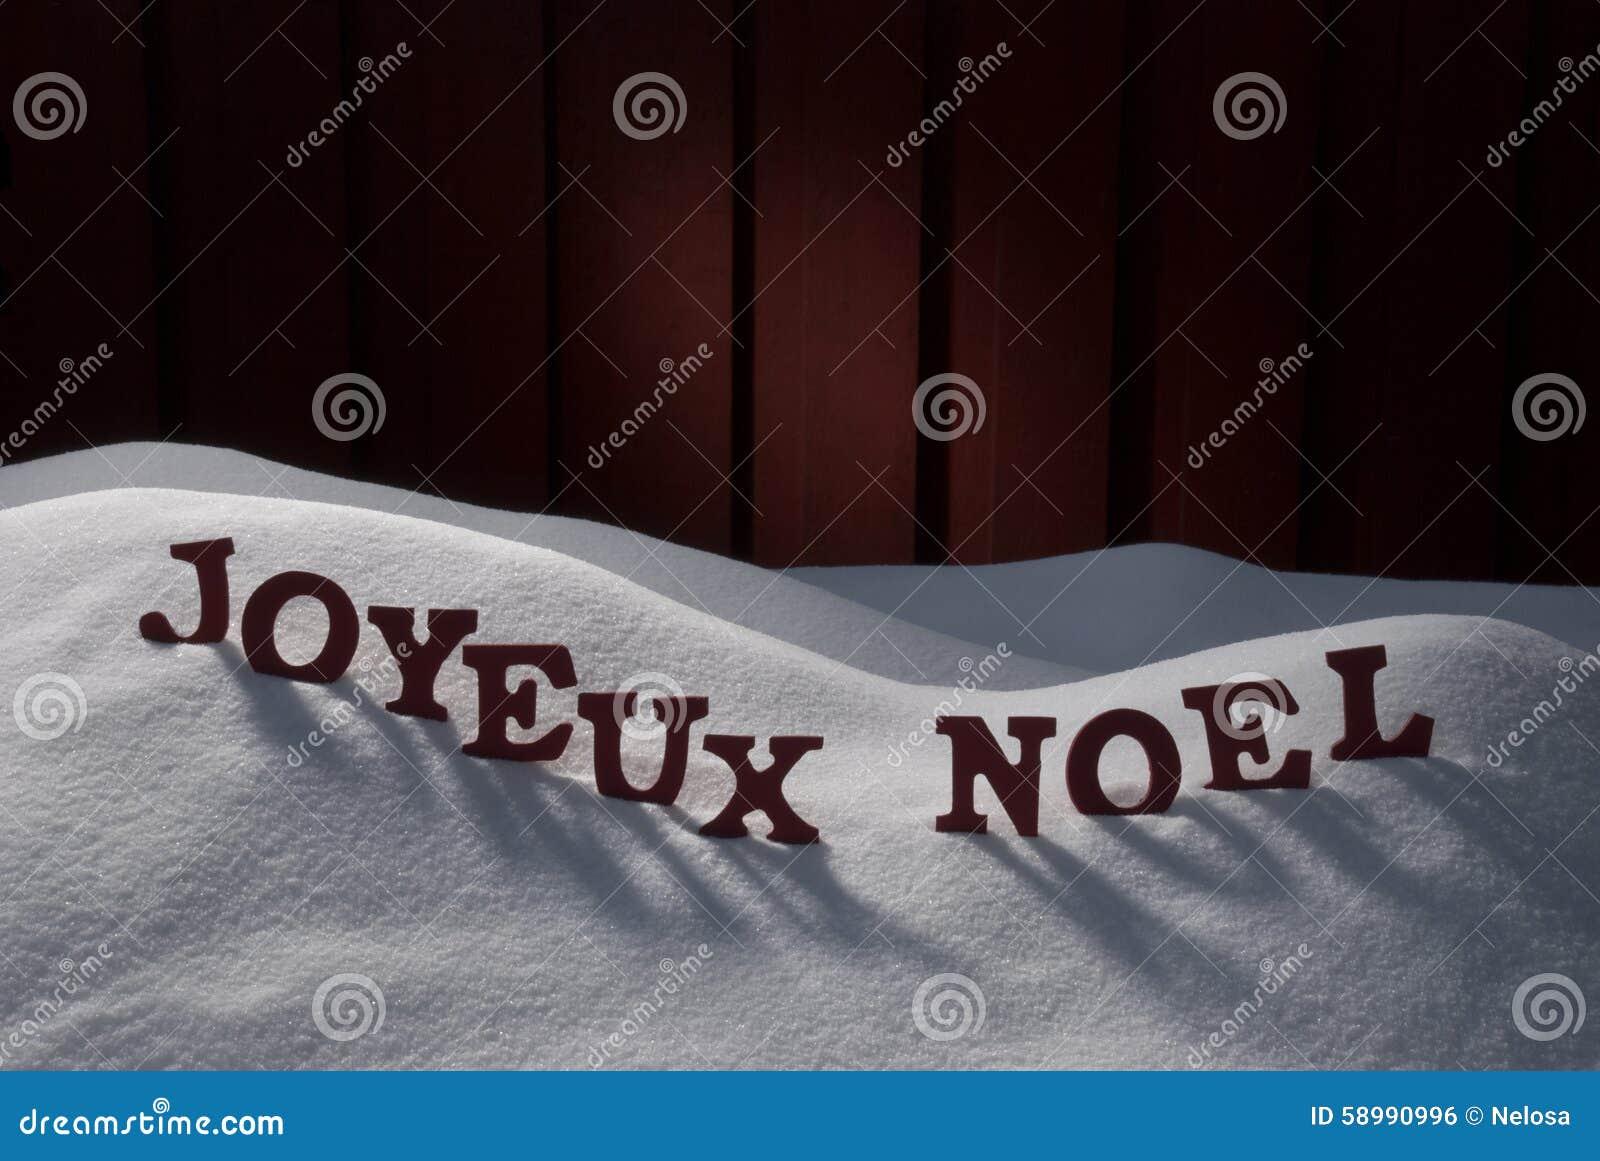 joyeux noel means merry christmas on snow stock photo. Black Bedroom Furniture Sets. Home Design Ideas